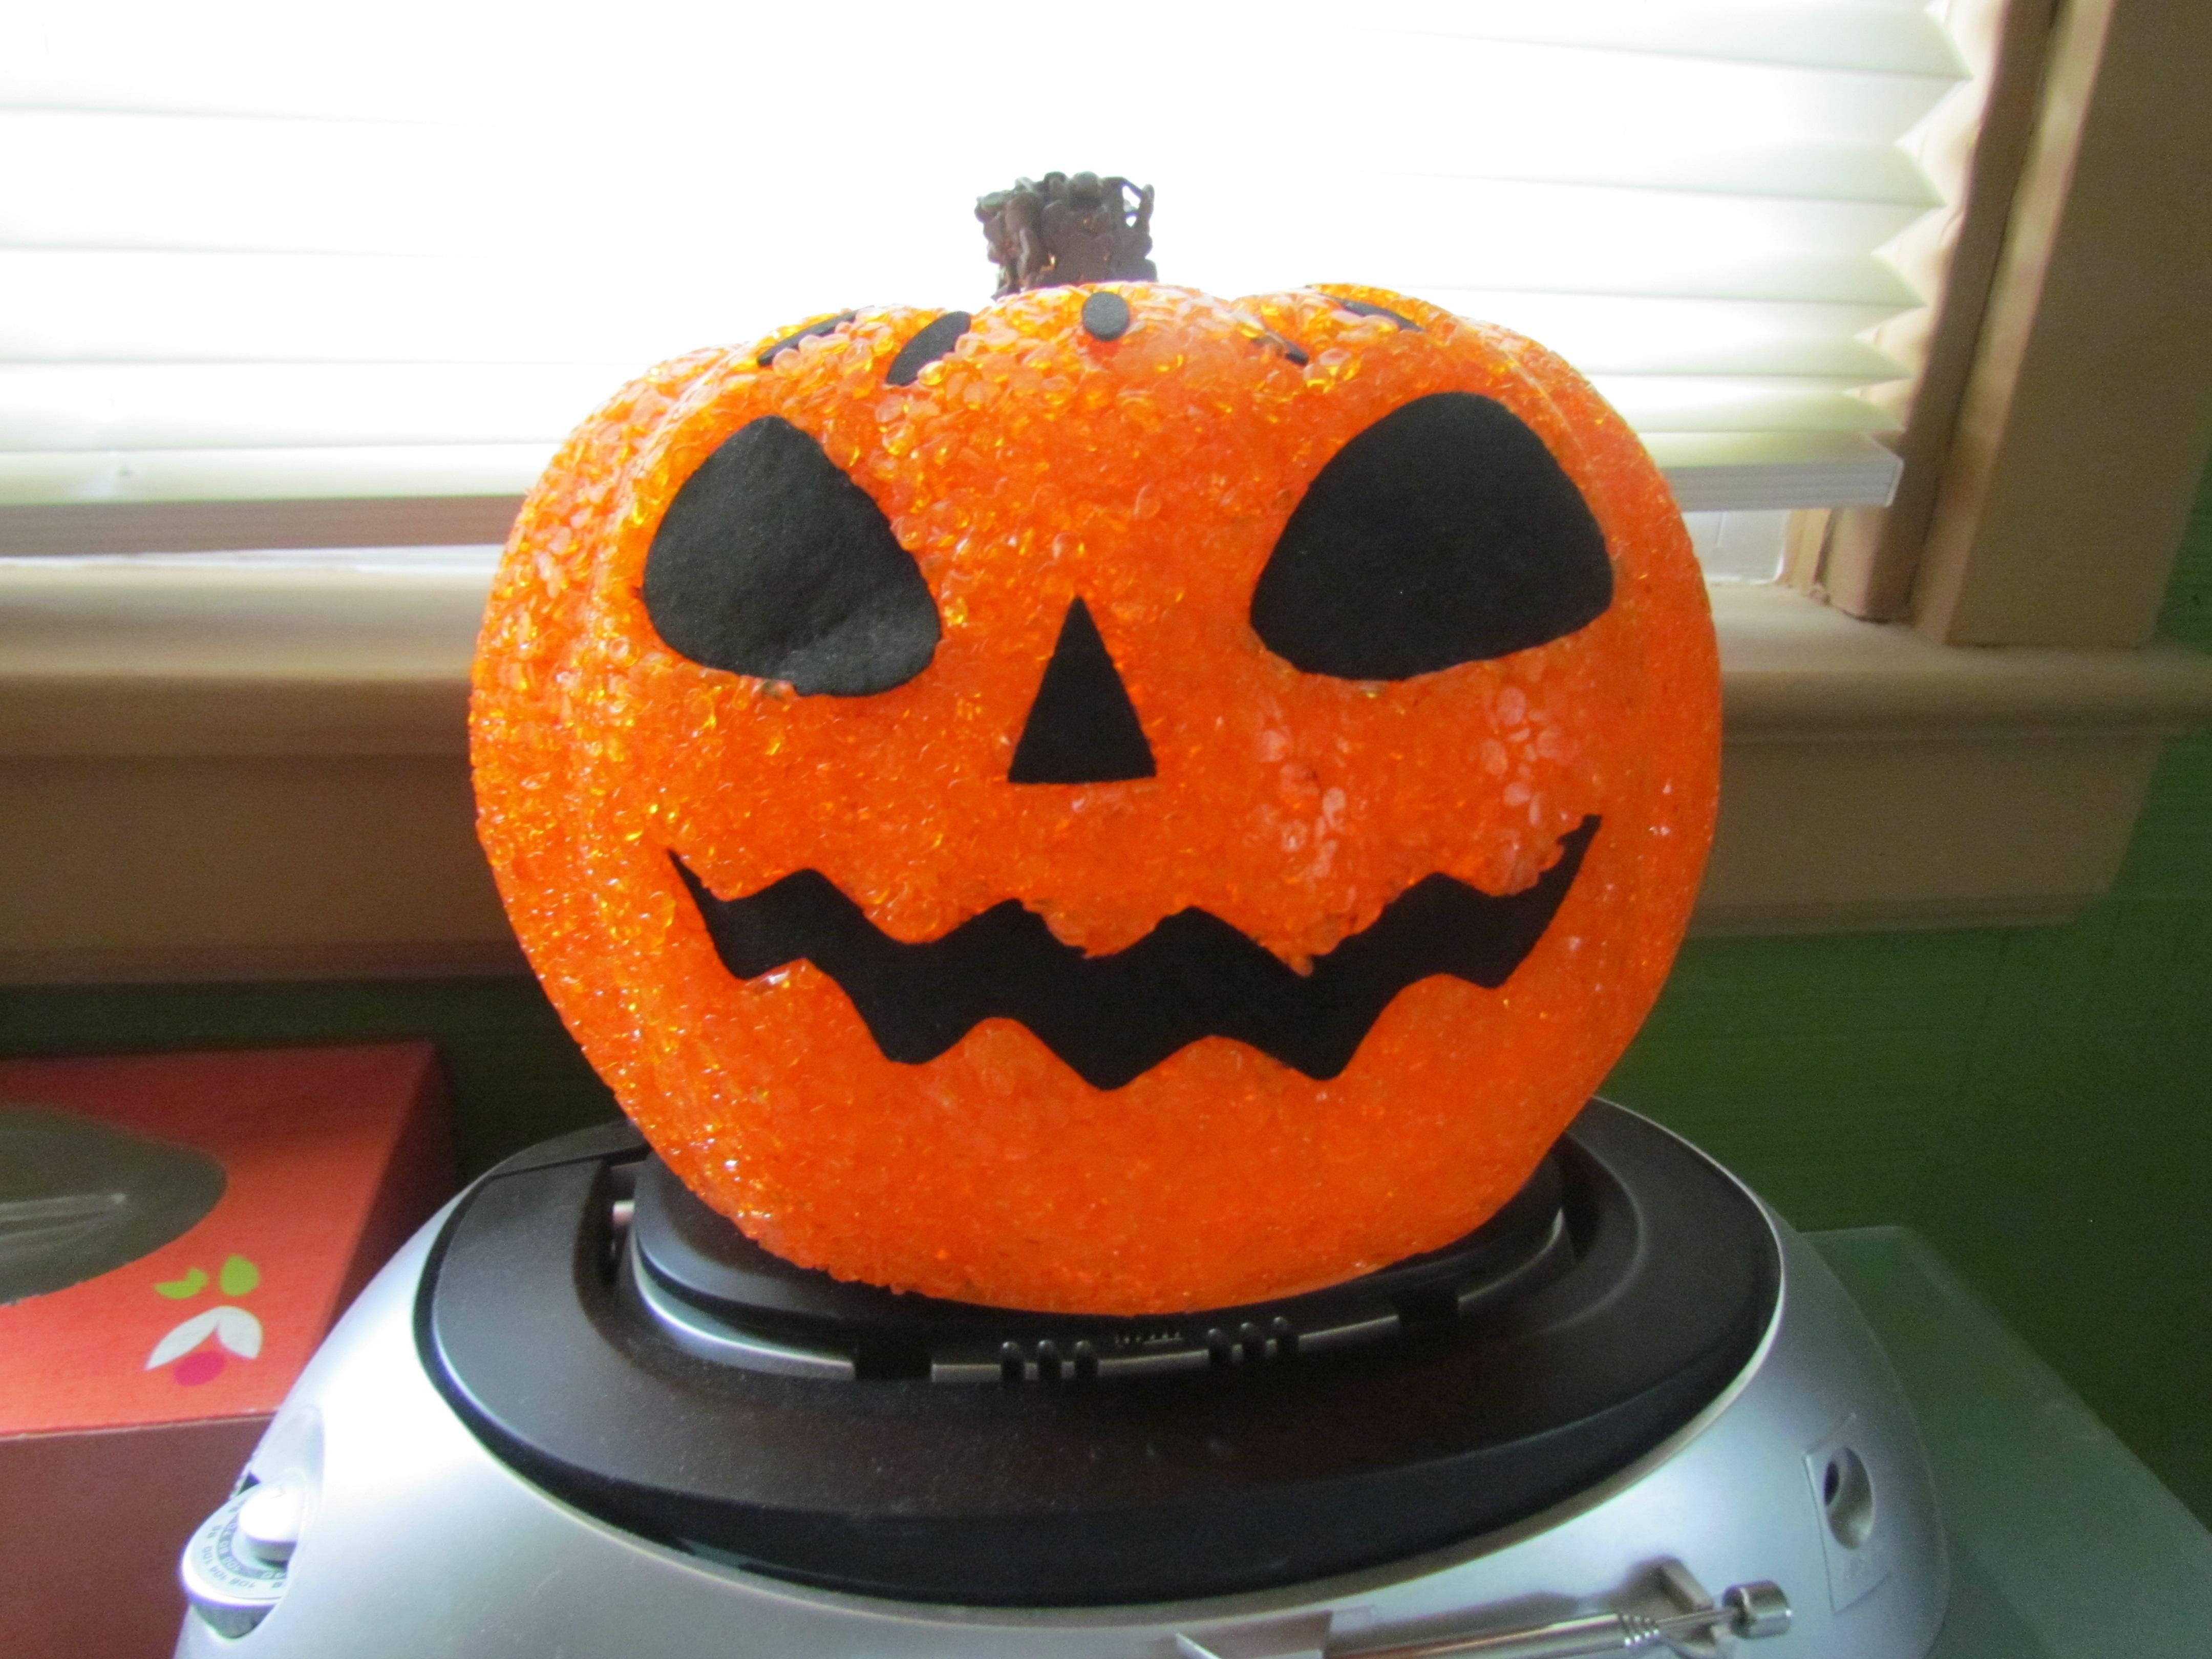 File:Pumpkin Glow Decoration on CD Player.JPG - Wikimedia Commons